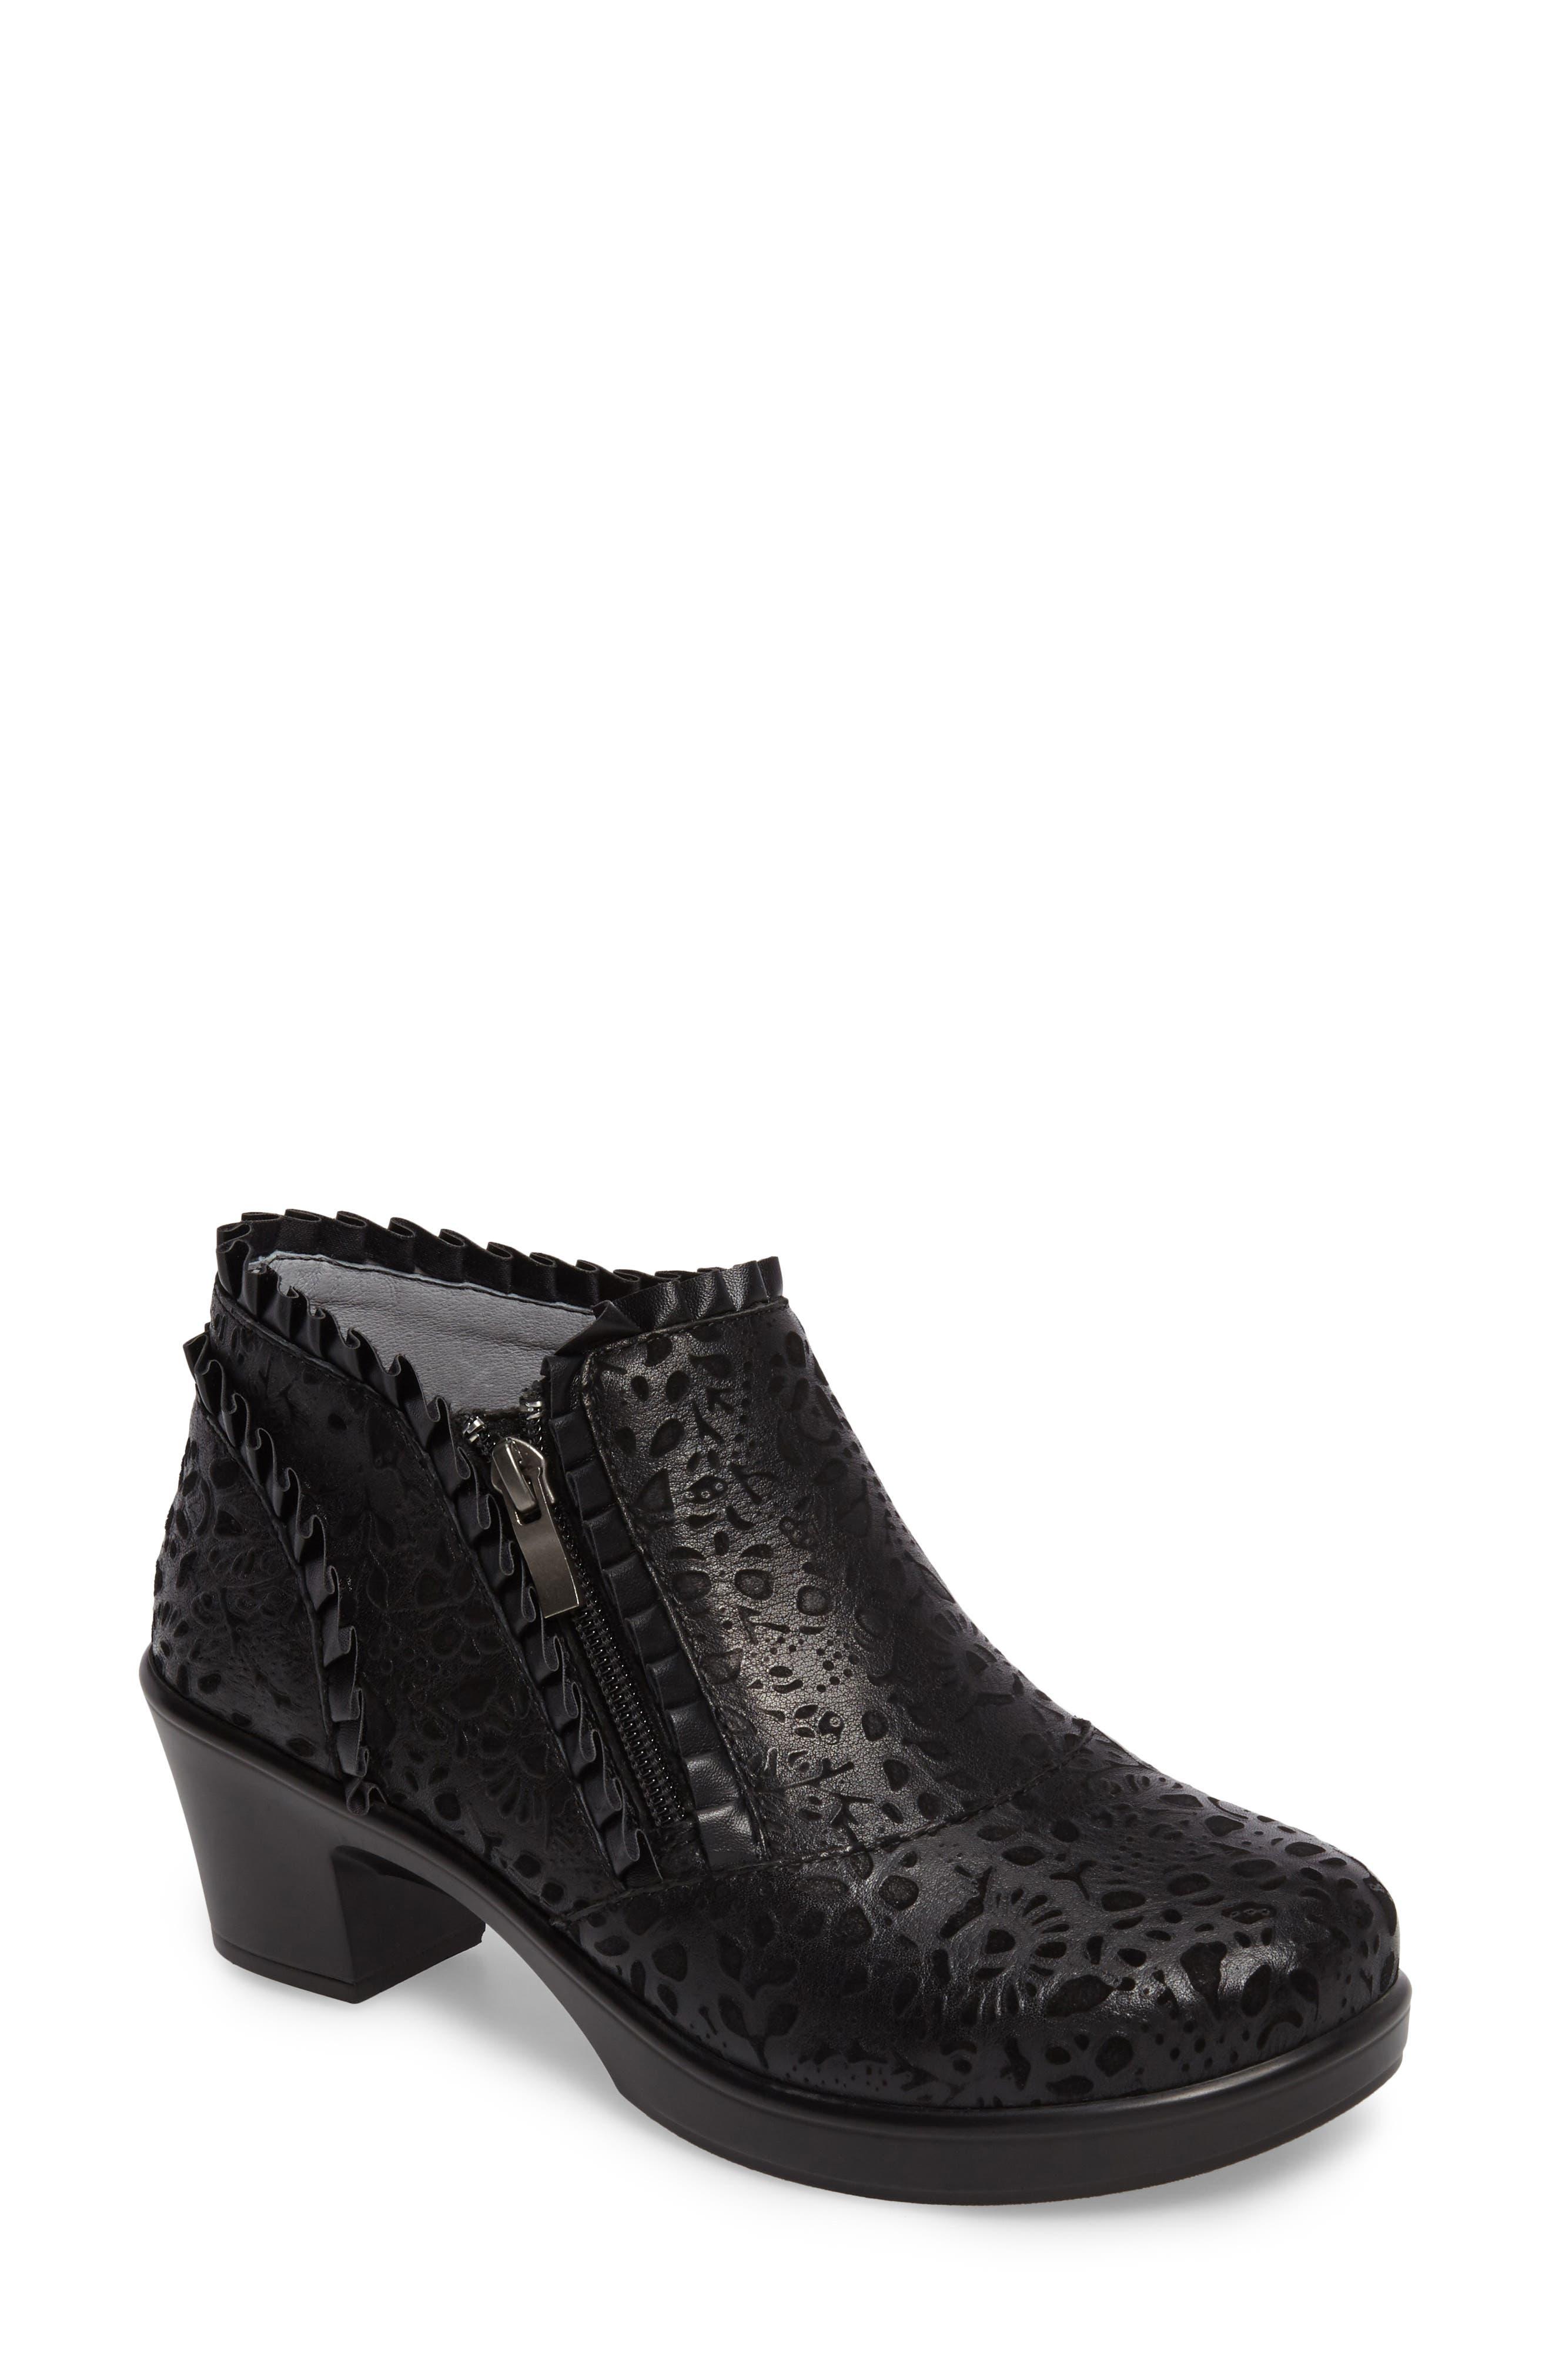 'Hannah' Saddle Boot,                         Main,                         color, Delicut Leather